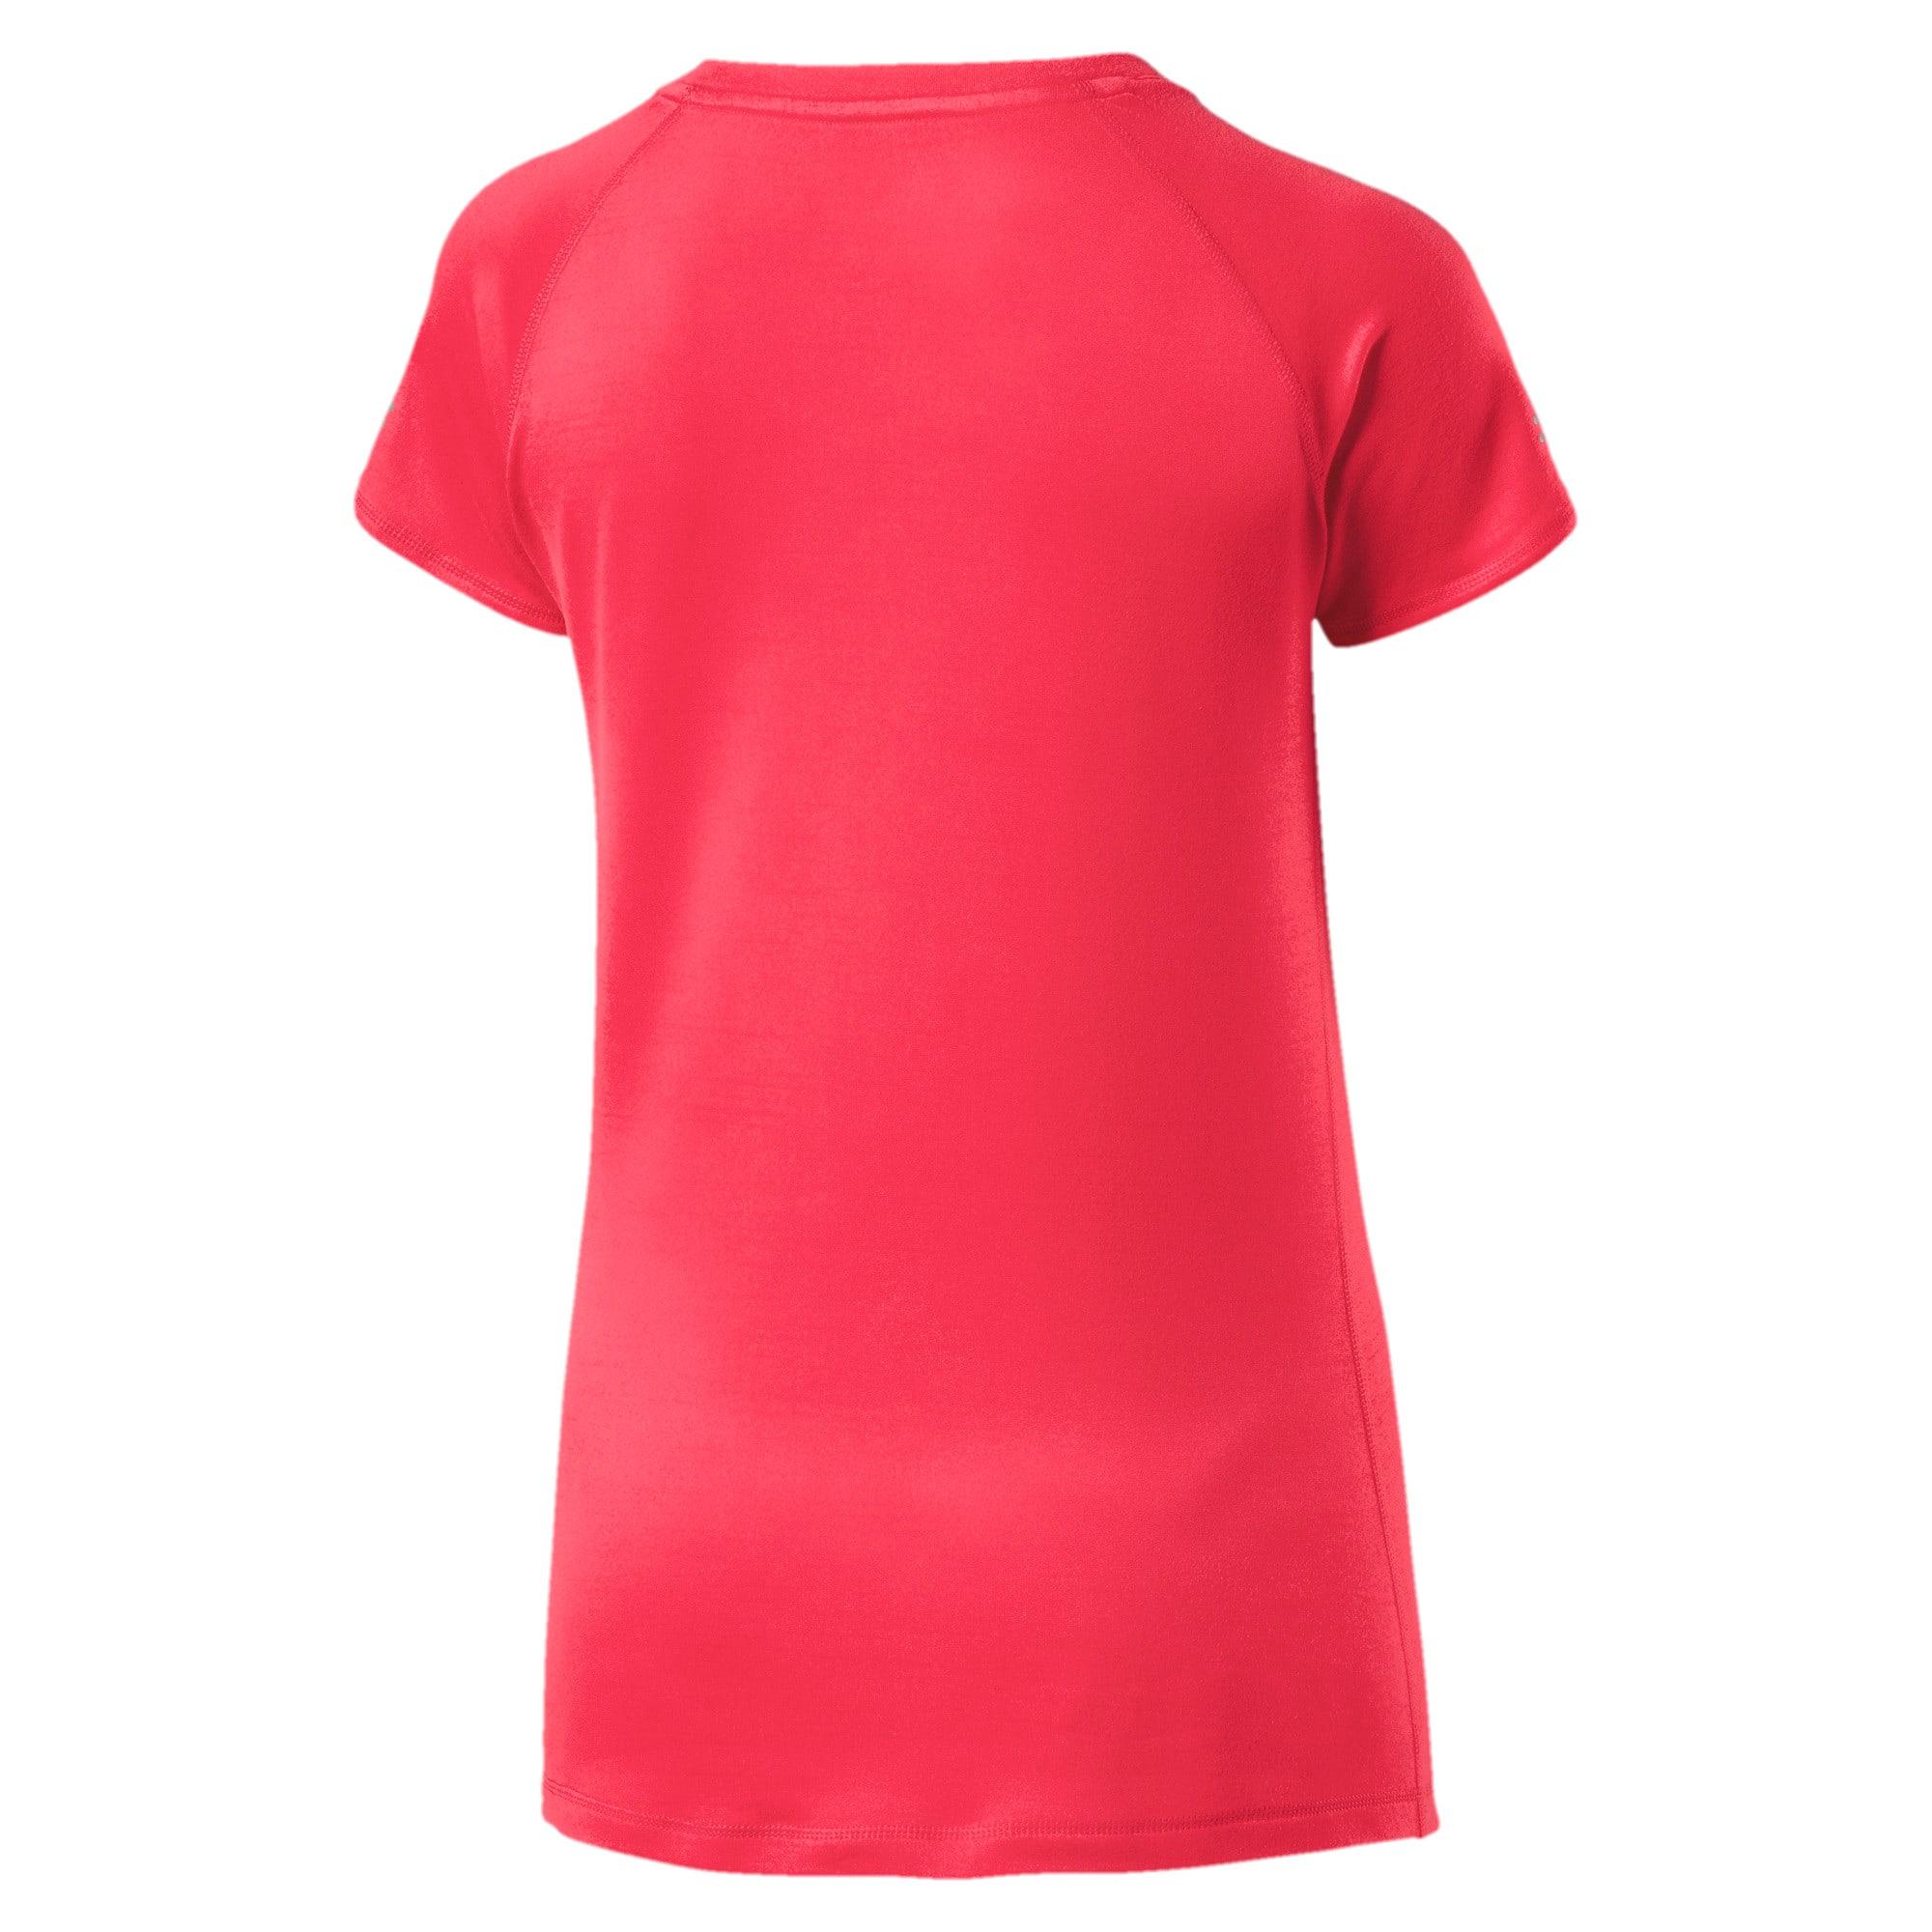 Thumbnail 2 of Epic Short Sleeve Women's Training Top, Paradise Pink Heather, medium-IND